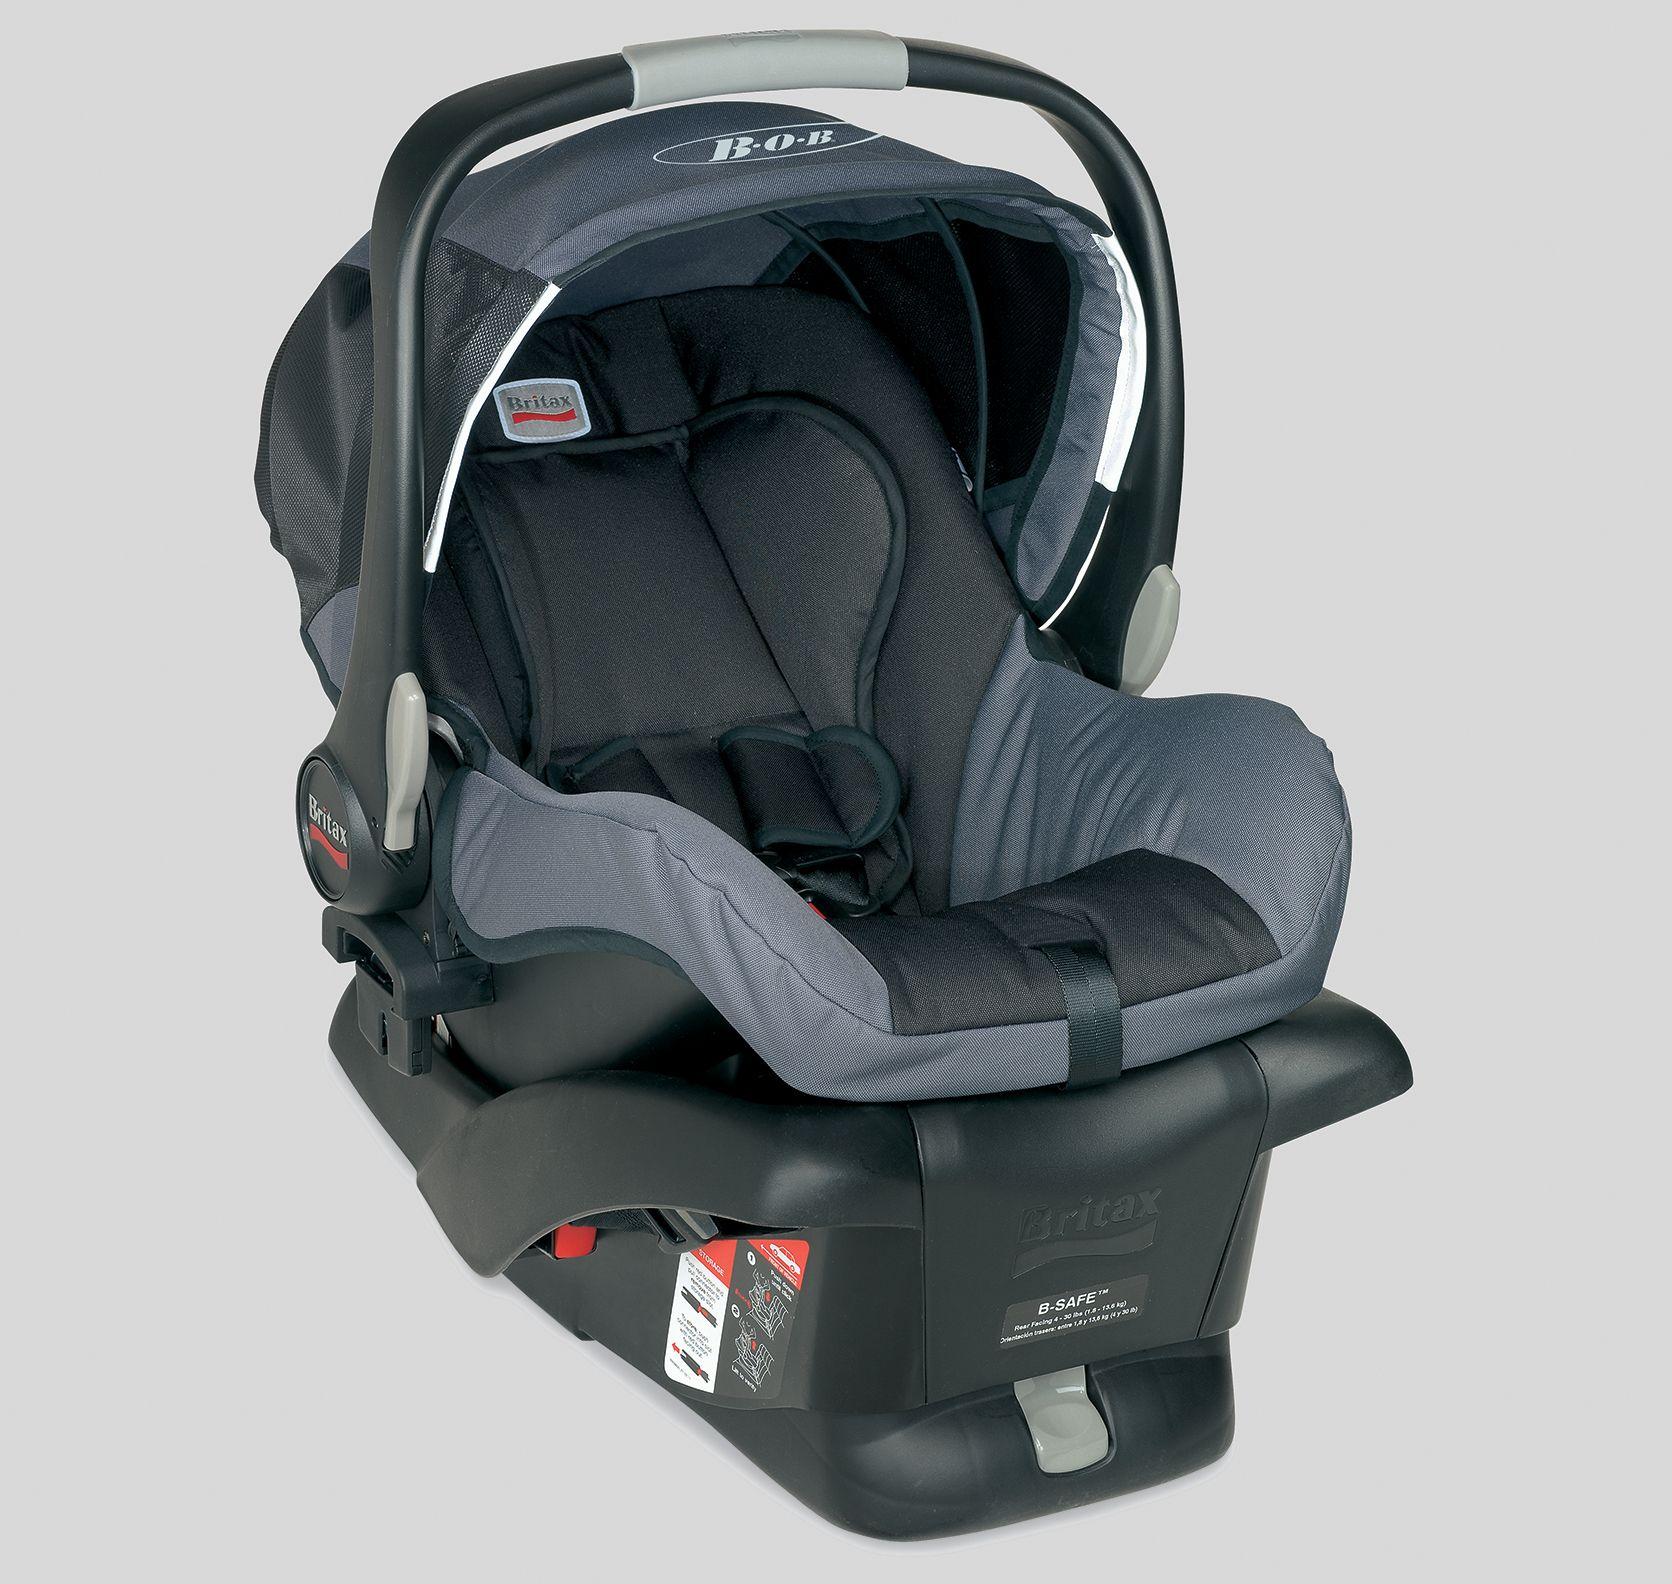 BOB BSAFE by BRITAX Baby car seats